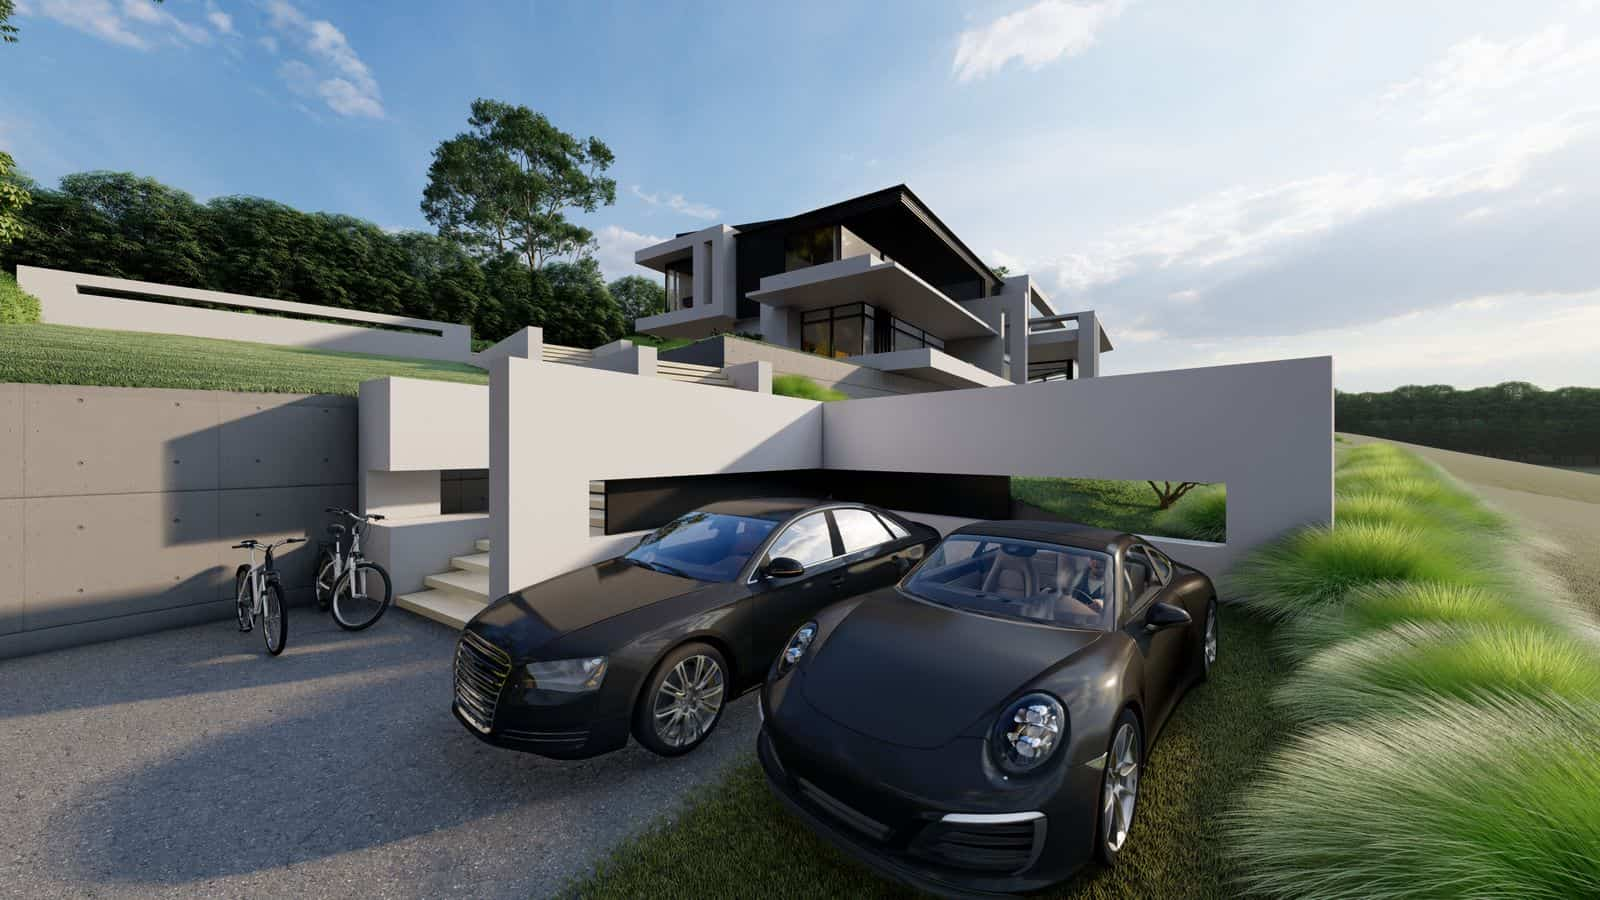 Haus am Hang modern